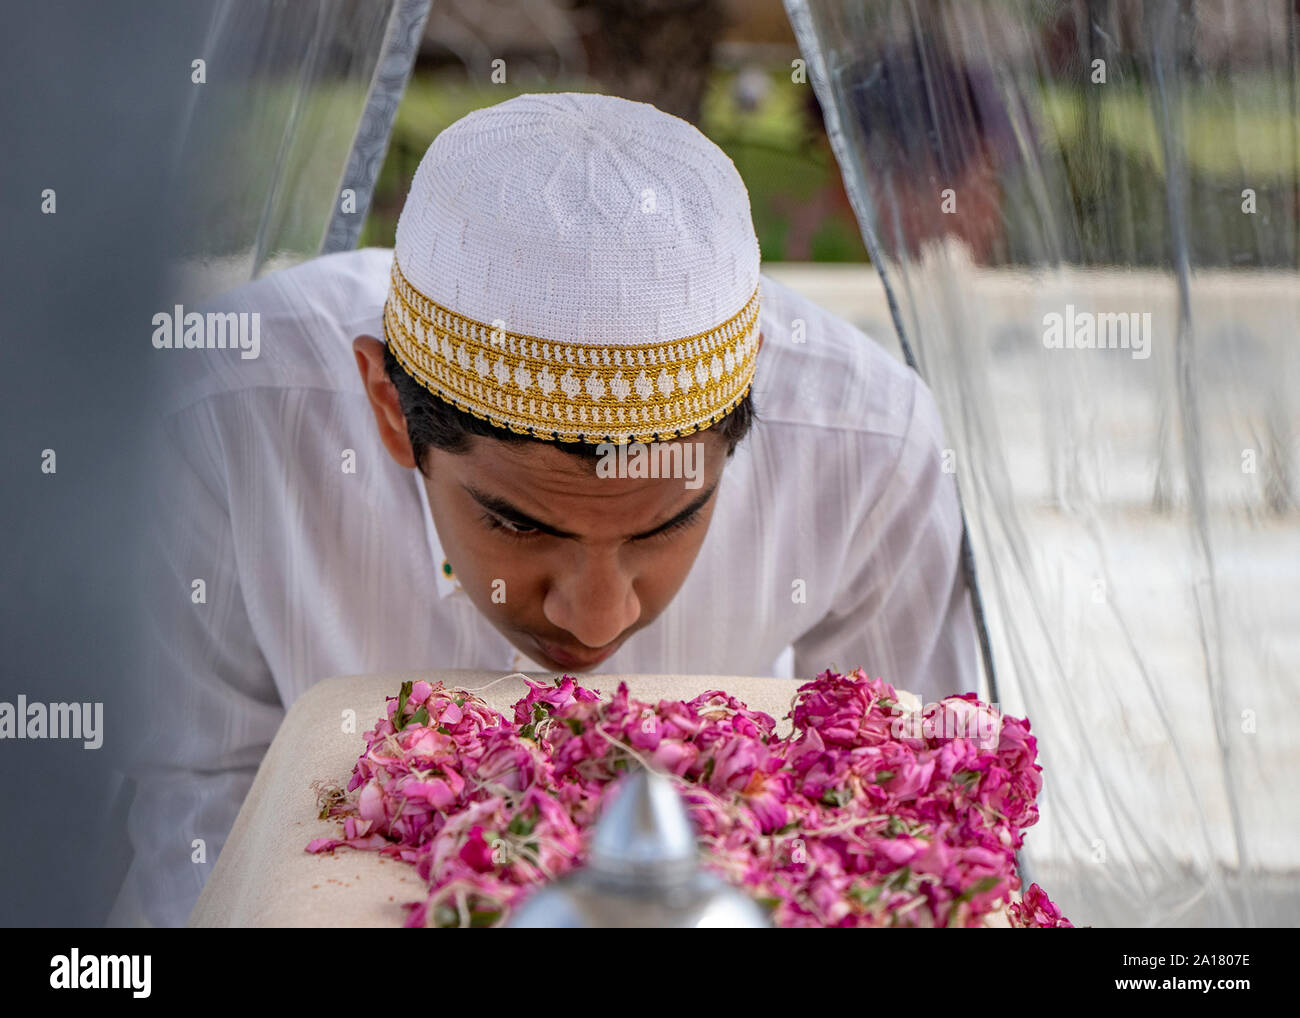 Bohra Muslims Stock Photos & Bohra Muslims Stock Images - Alamy